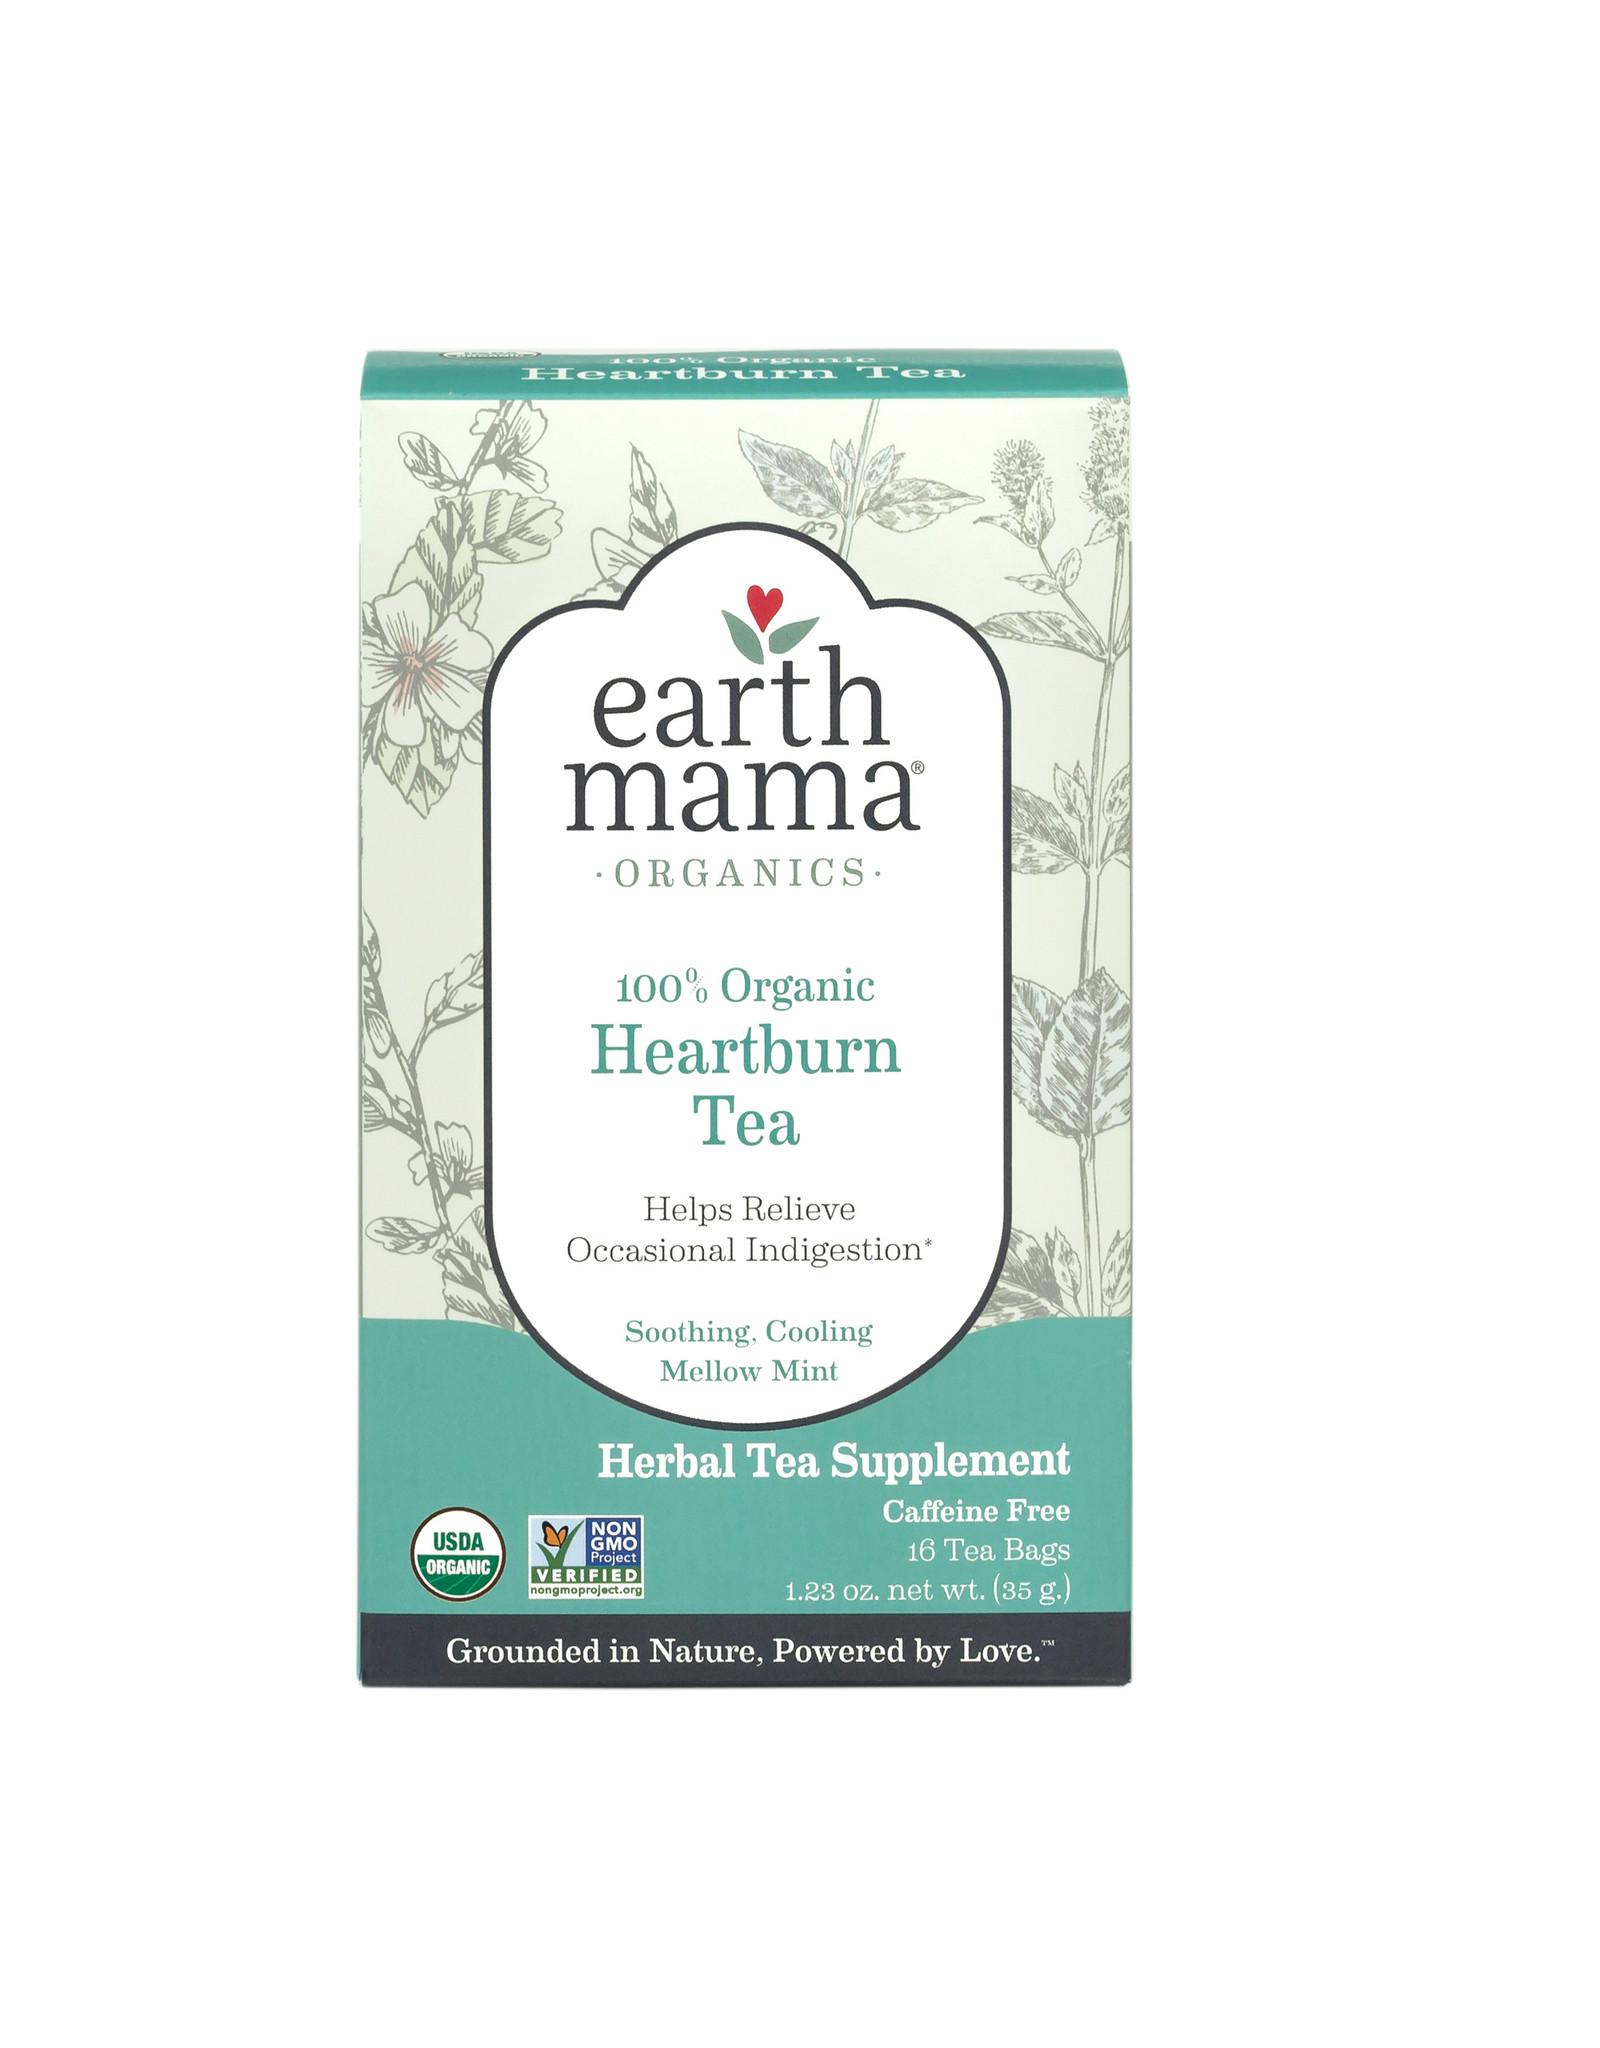 Earth Mama Earth Mama Organic Heartburn Tea